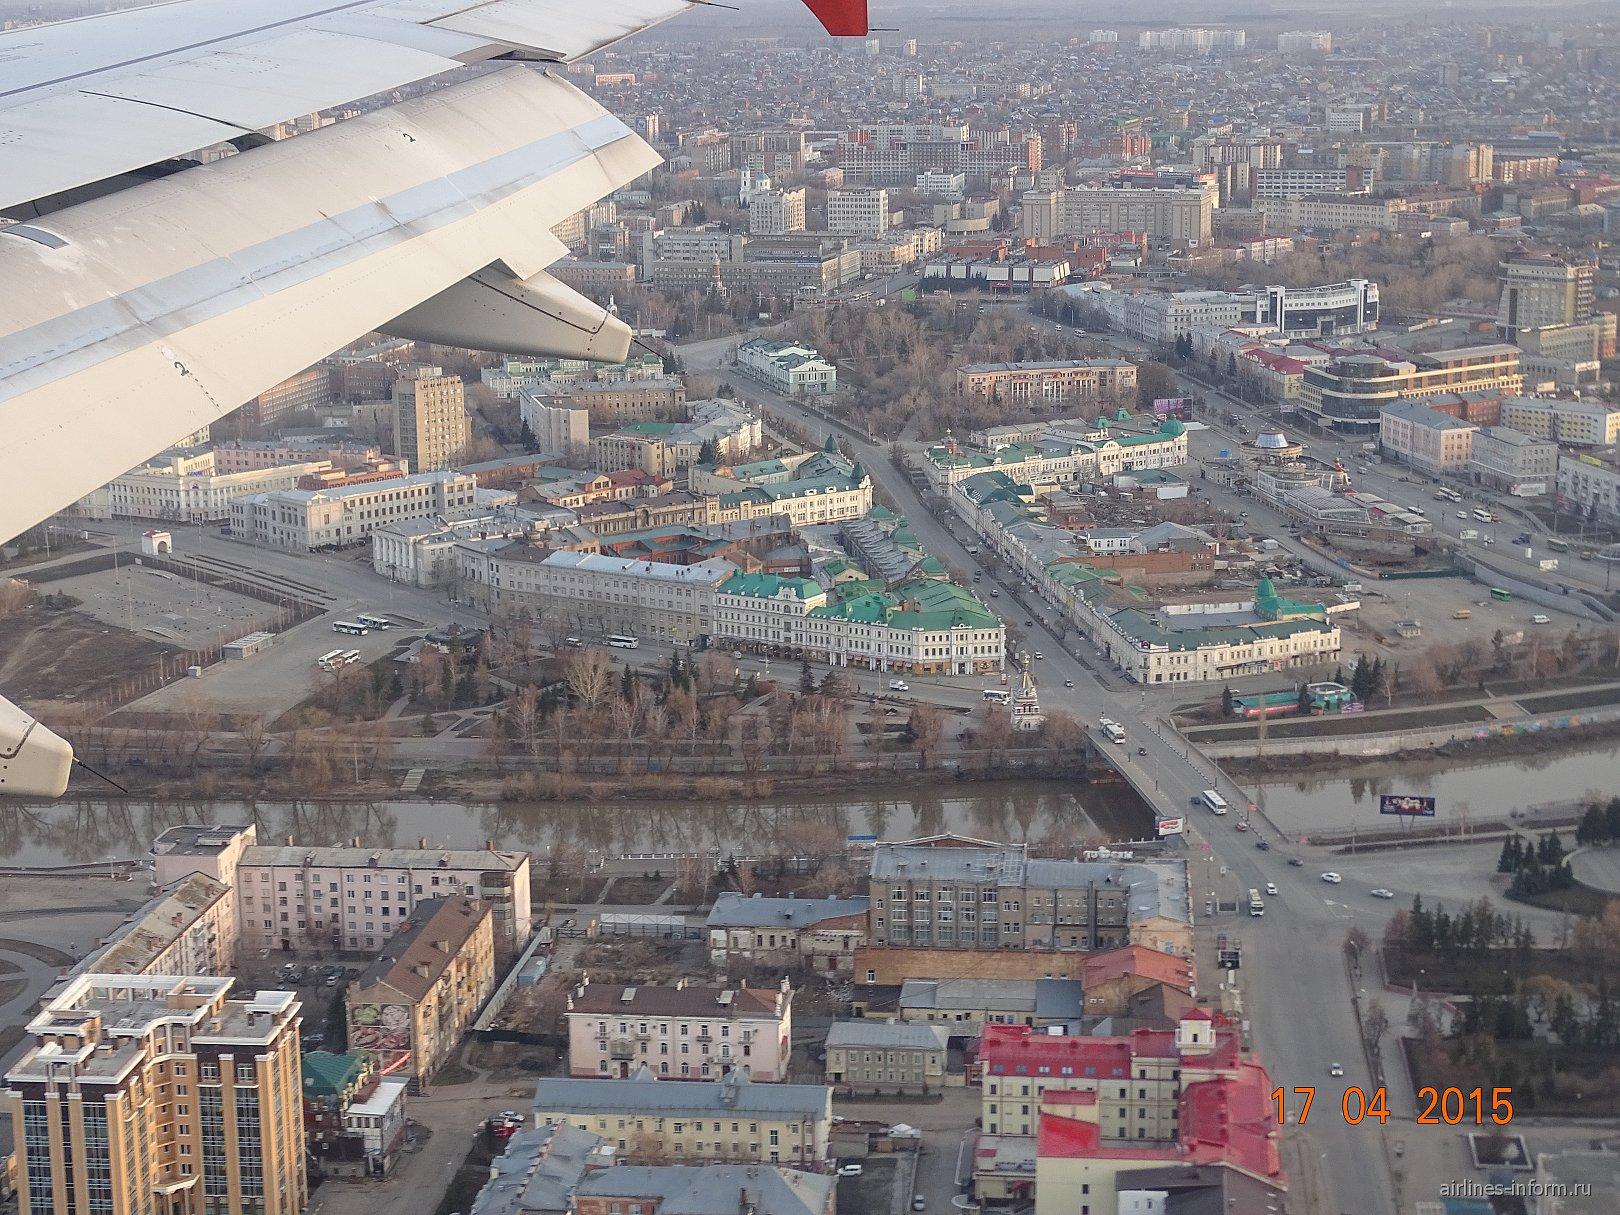 В полете над центром Омска перед посадкой в аэропорту